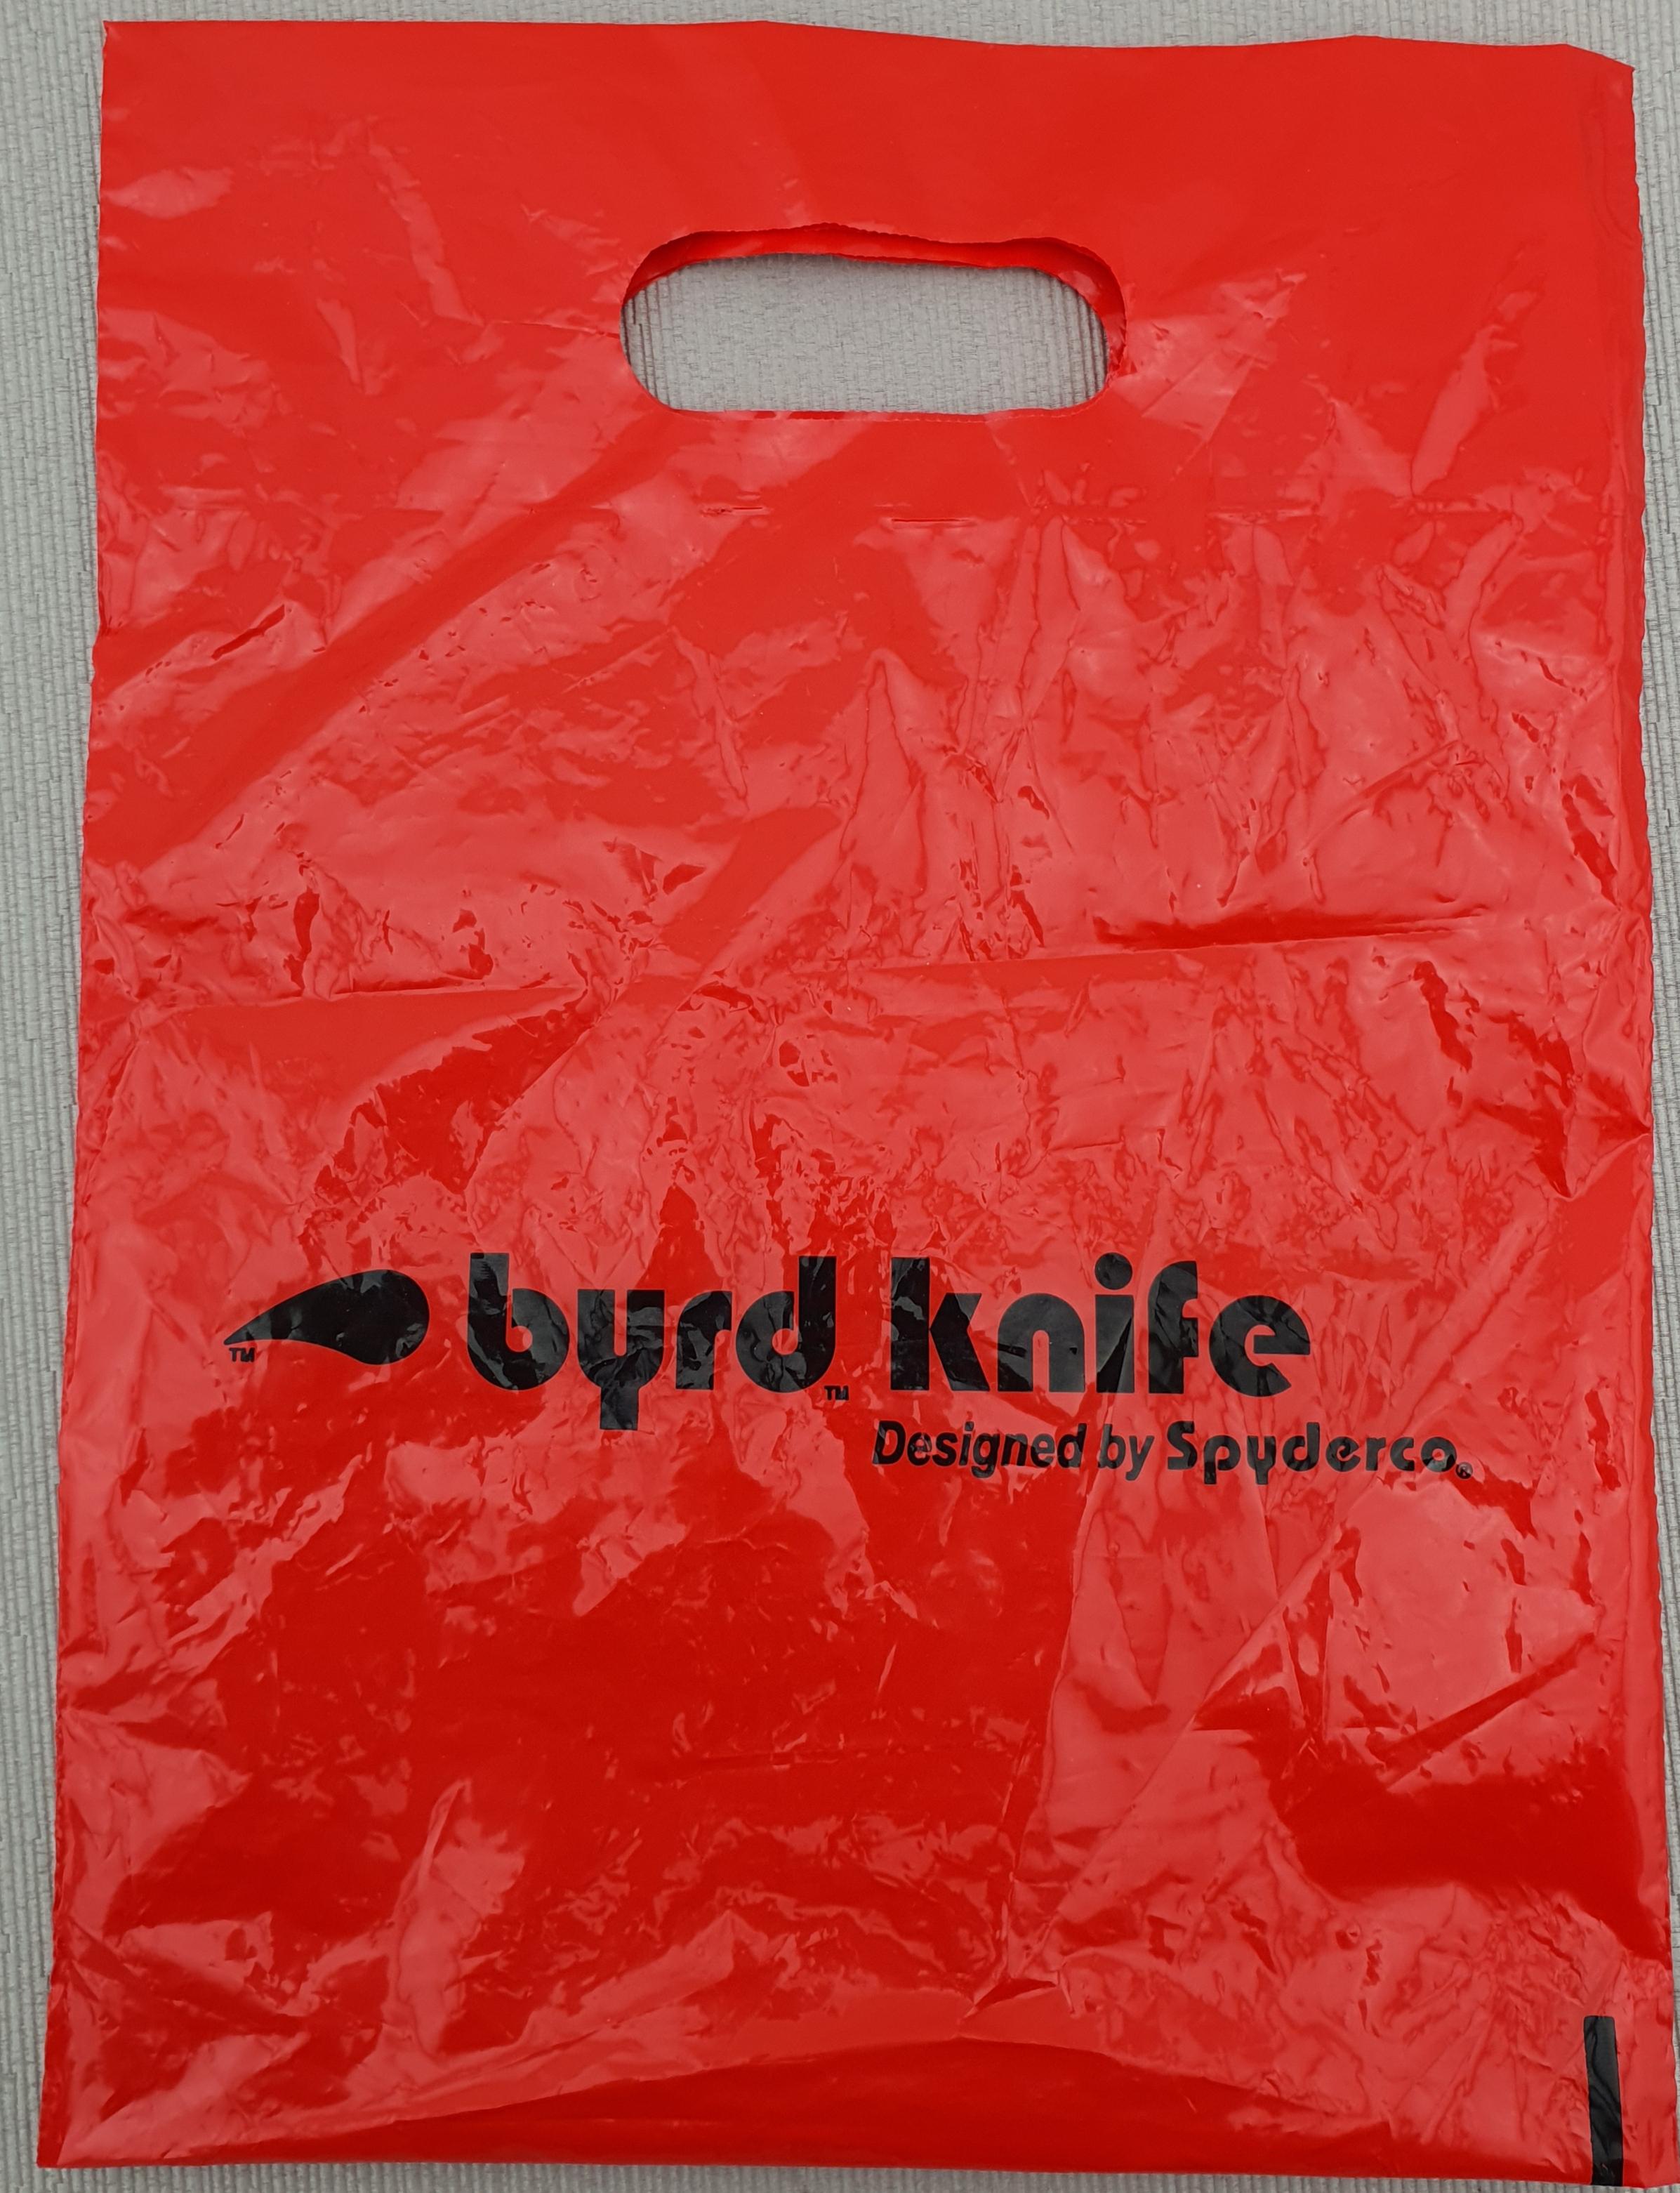 Spyderco bag vintage small reverse